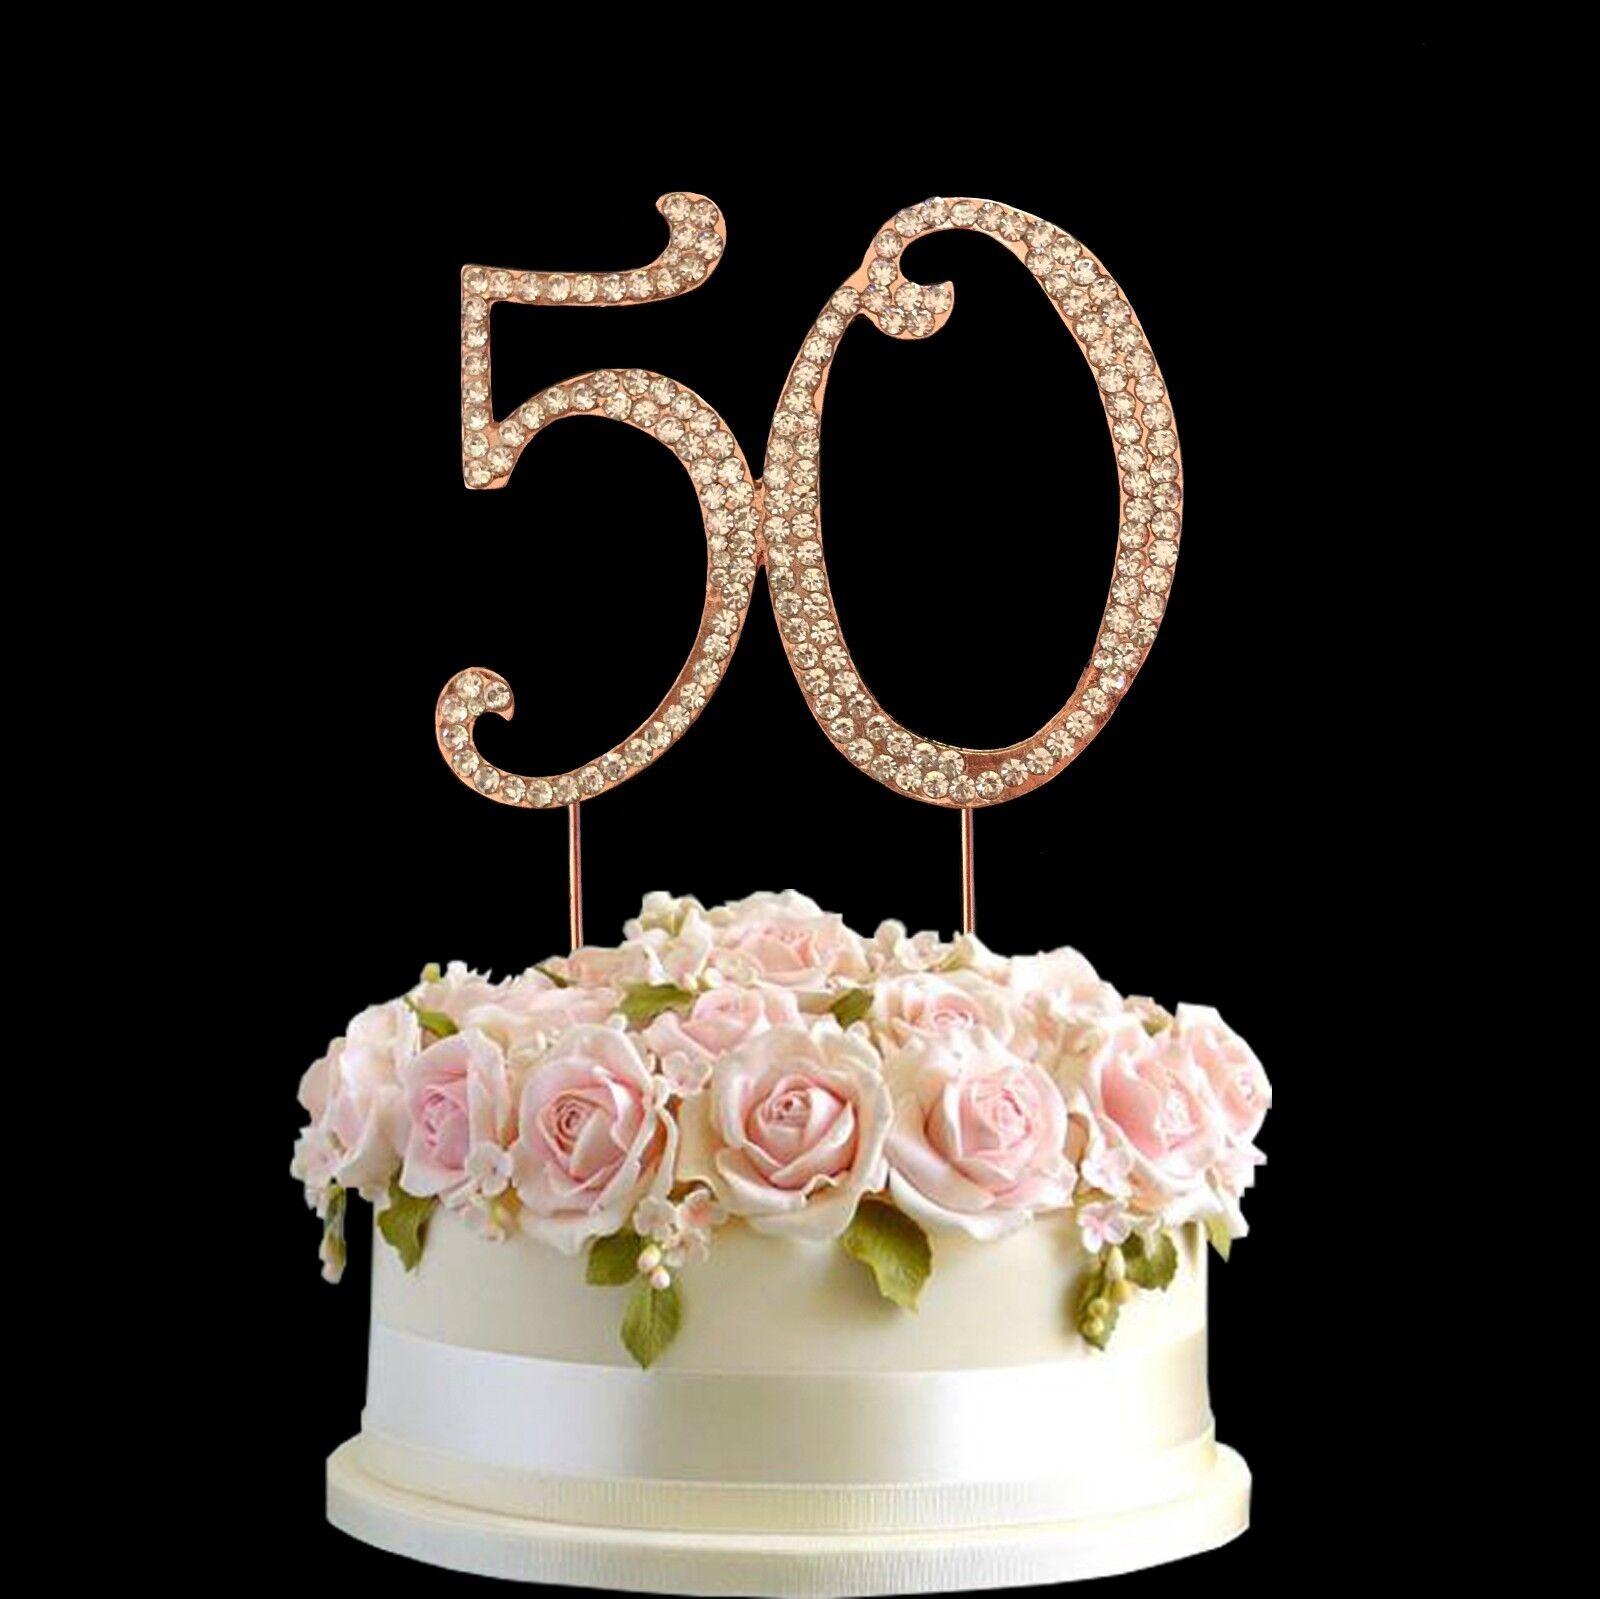 Rhinestone Sweet 16 16th Birthday Anniversary Cake Topper Pink with Diamante